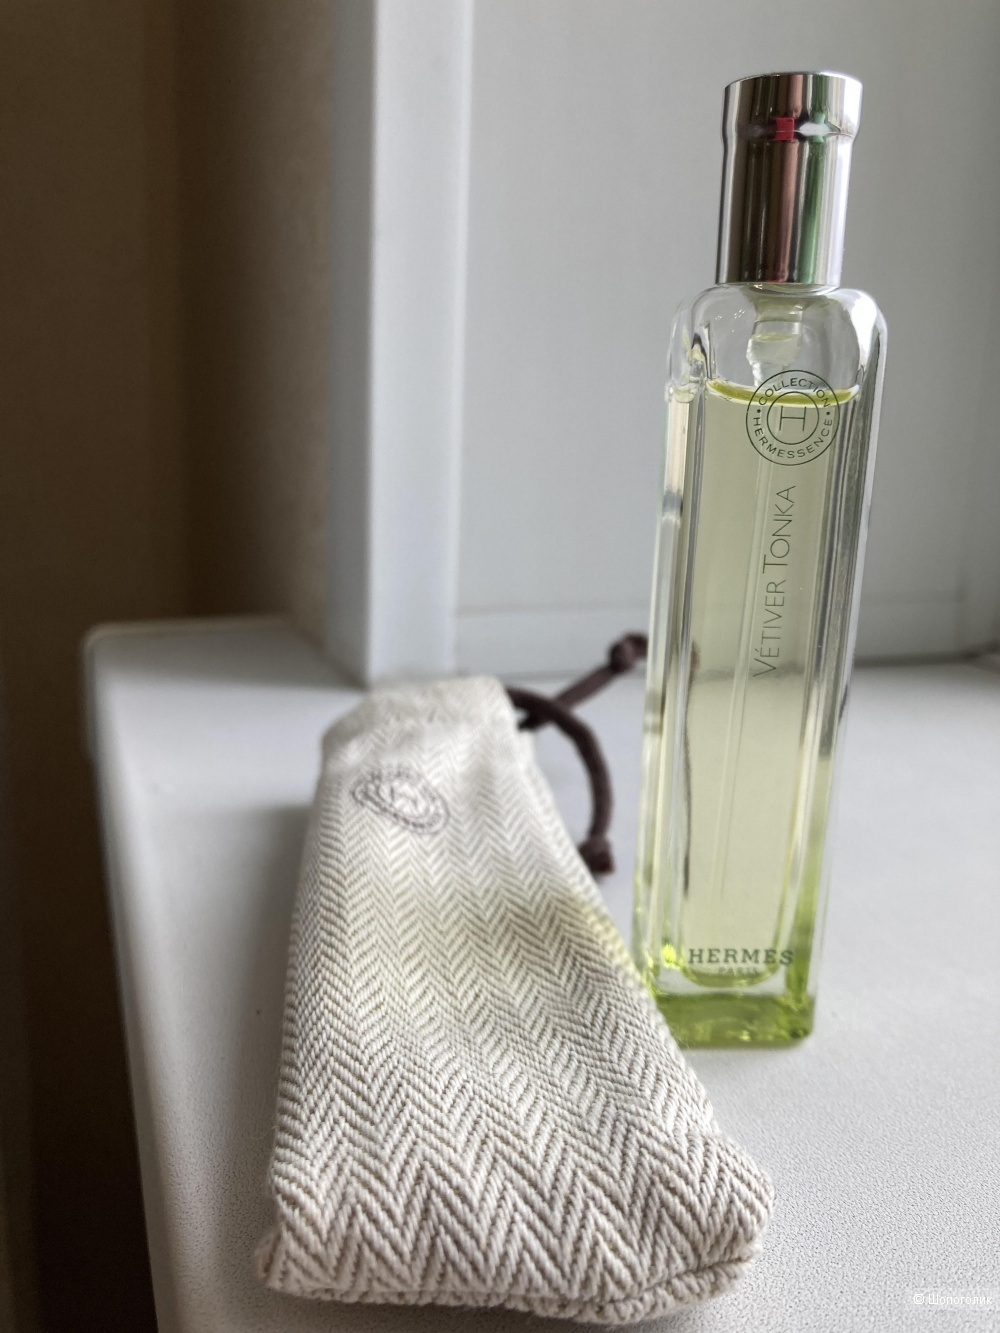 Туалетная вода, Hermessence Vetiver Tonka Hermès для мужчин и женщин, 13.5 из 15 мл